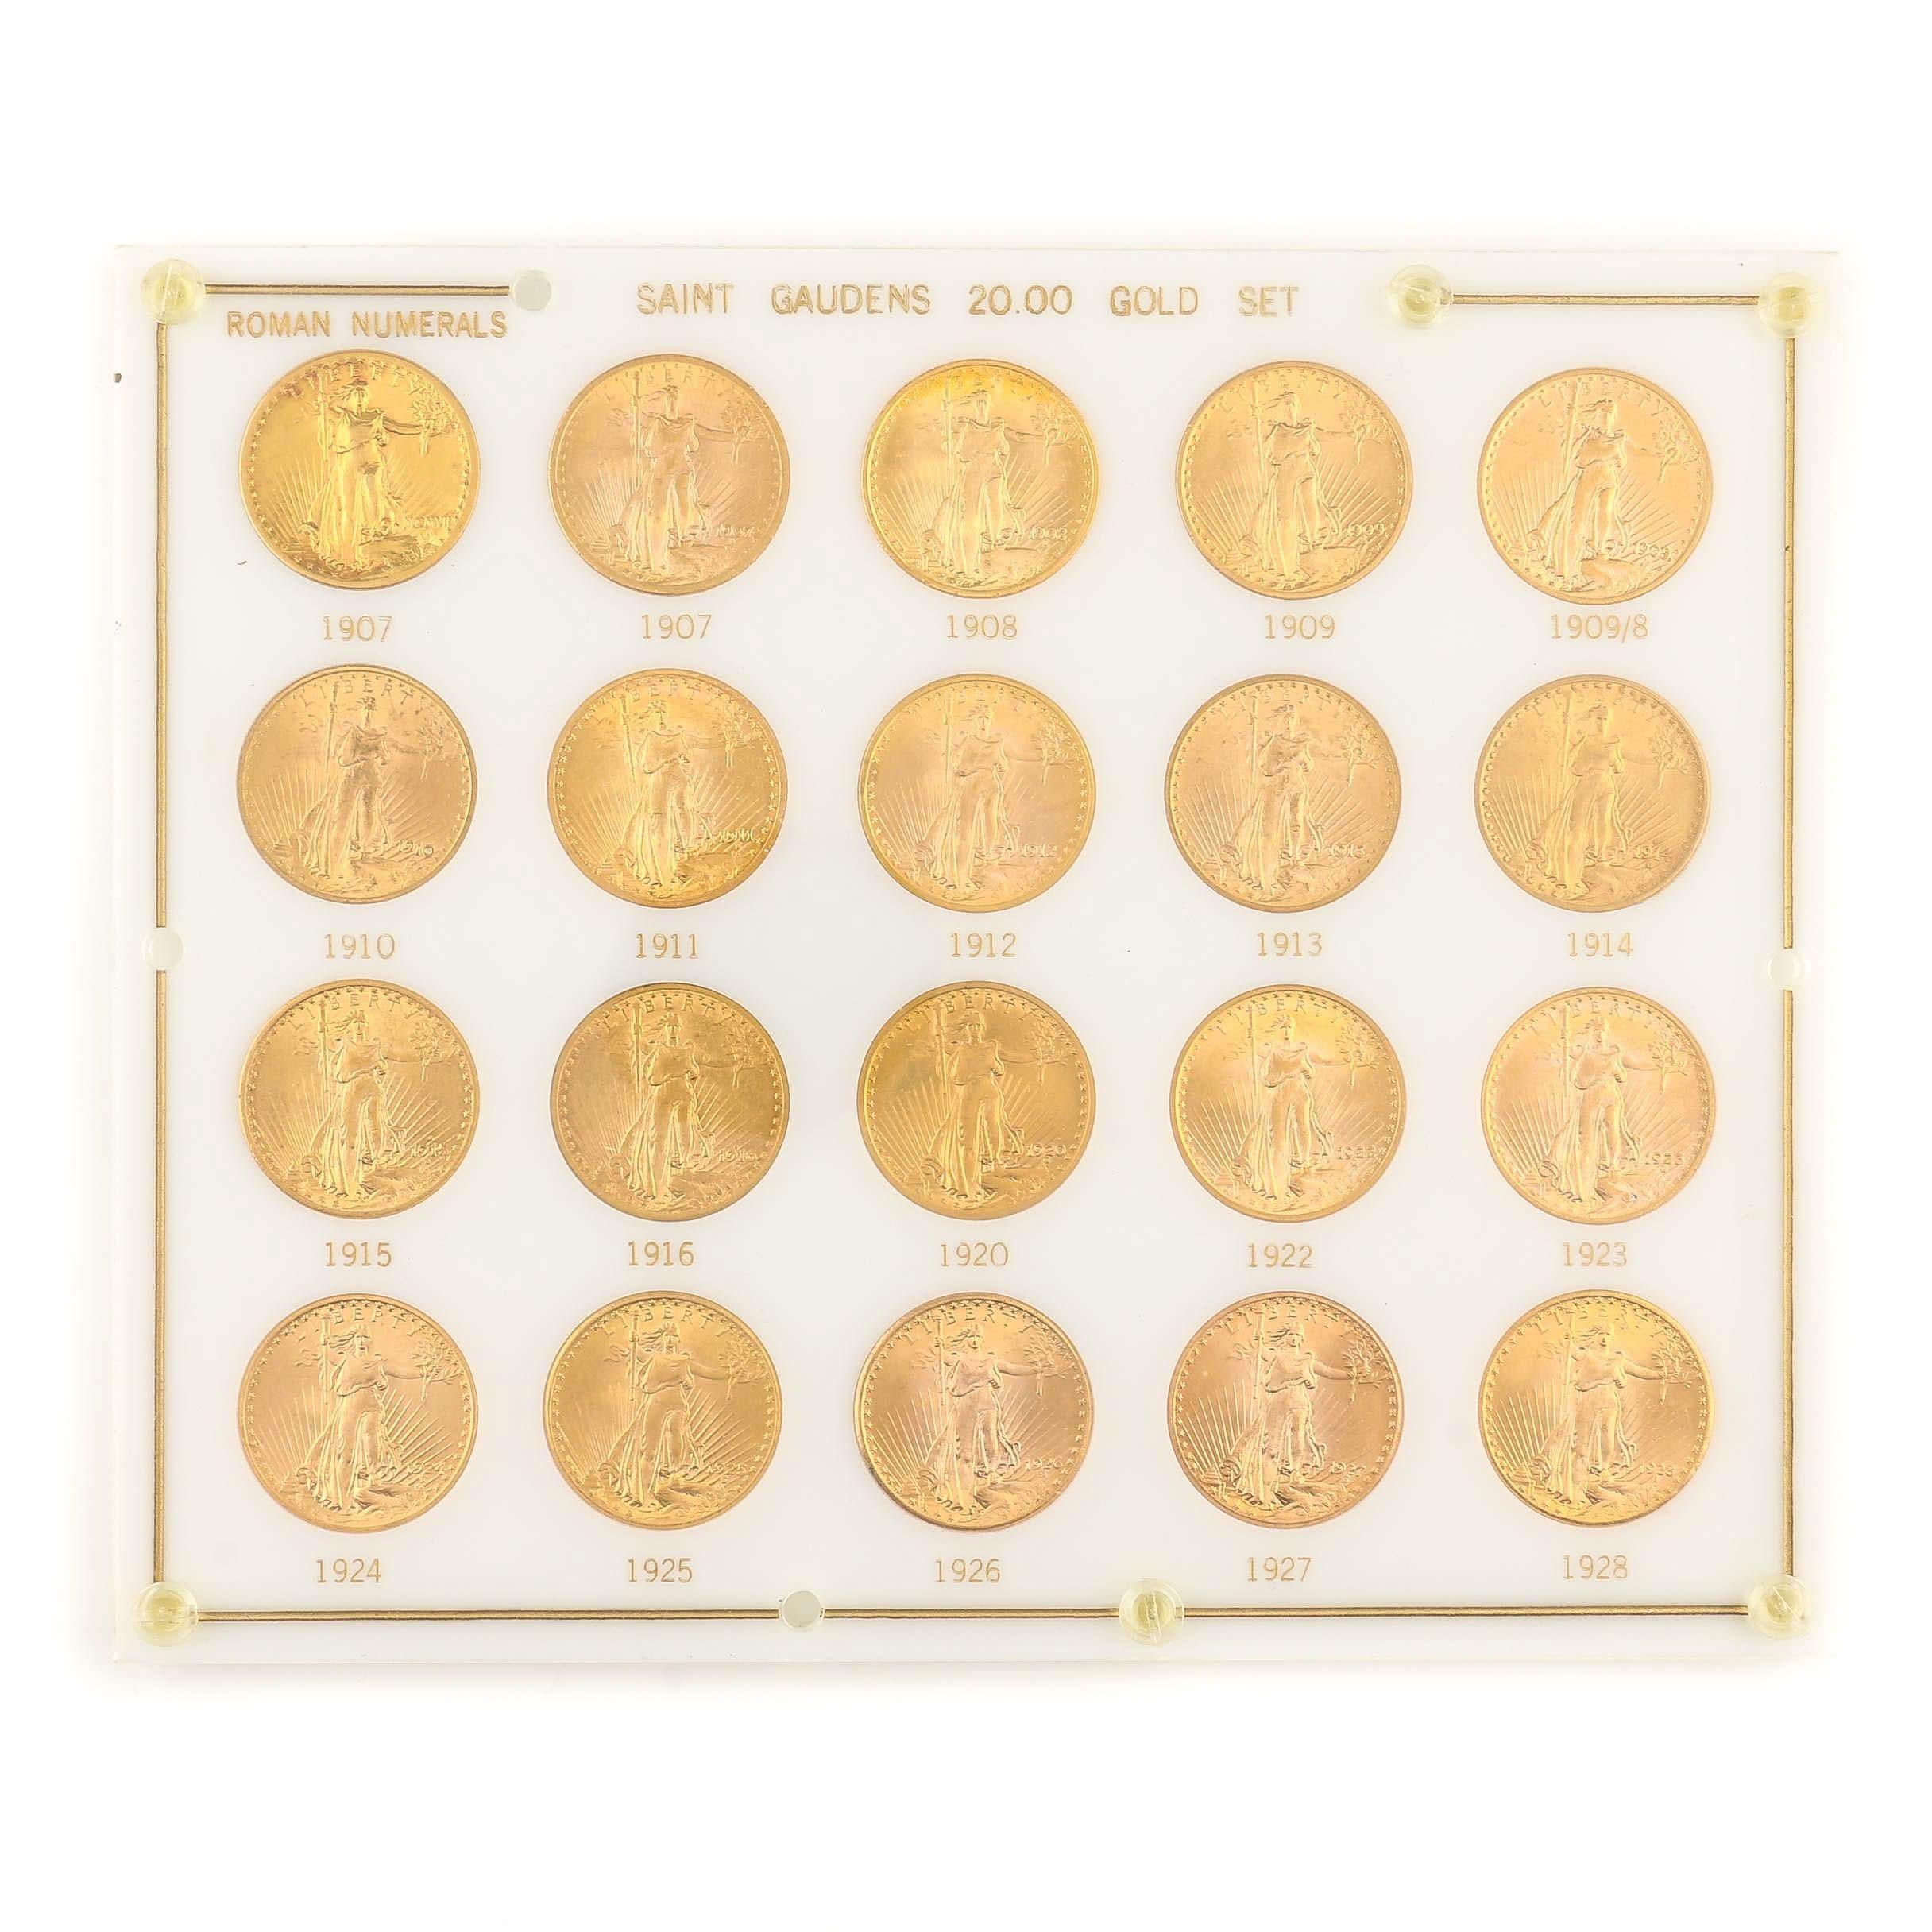 Set of Twenty Saint Gaudens $20 Gold Double Eagles, 1907-1928